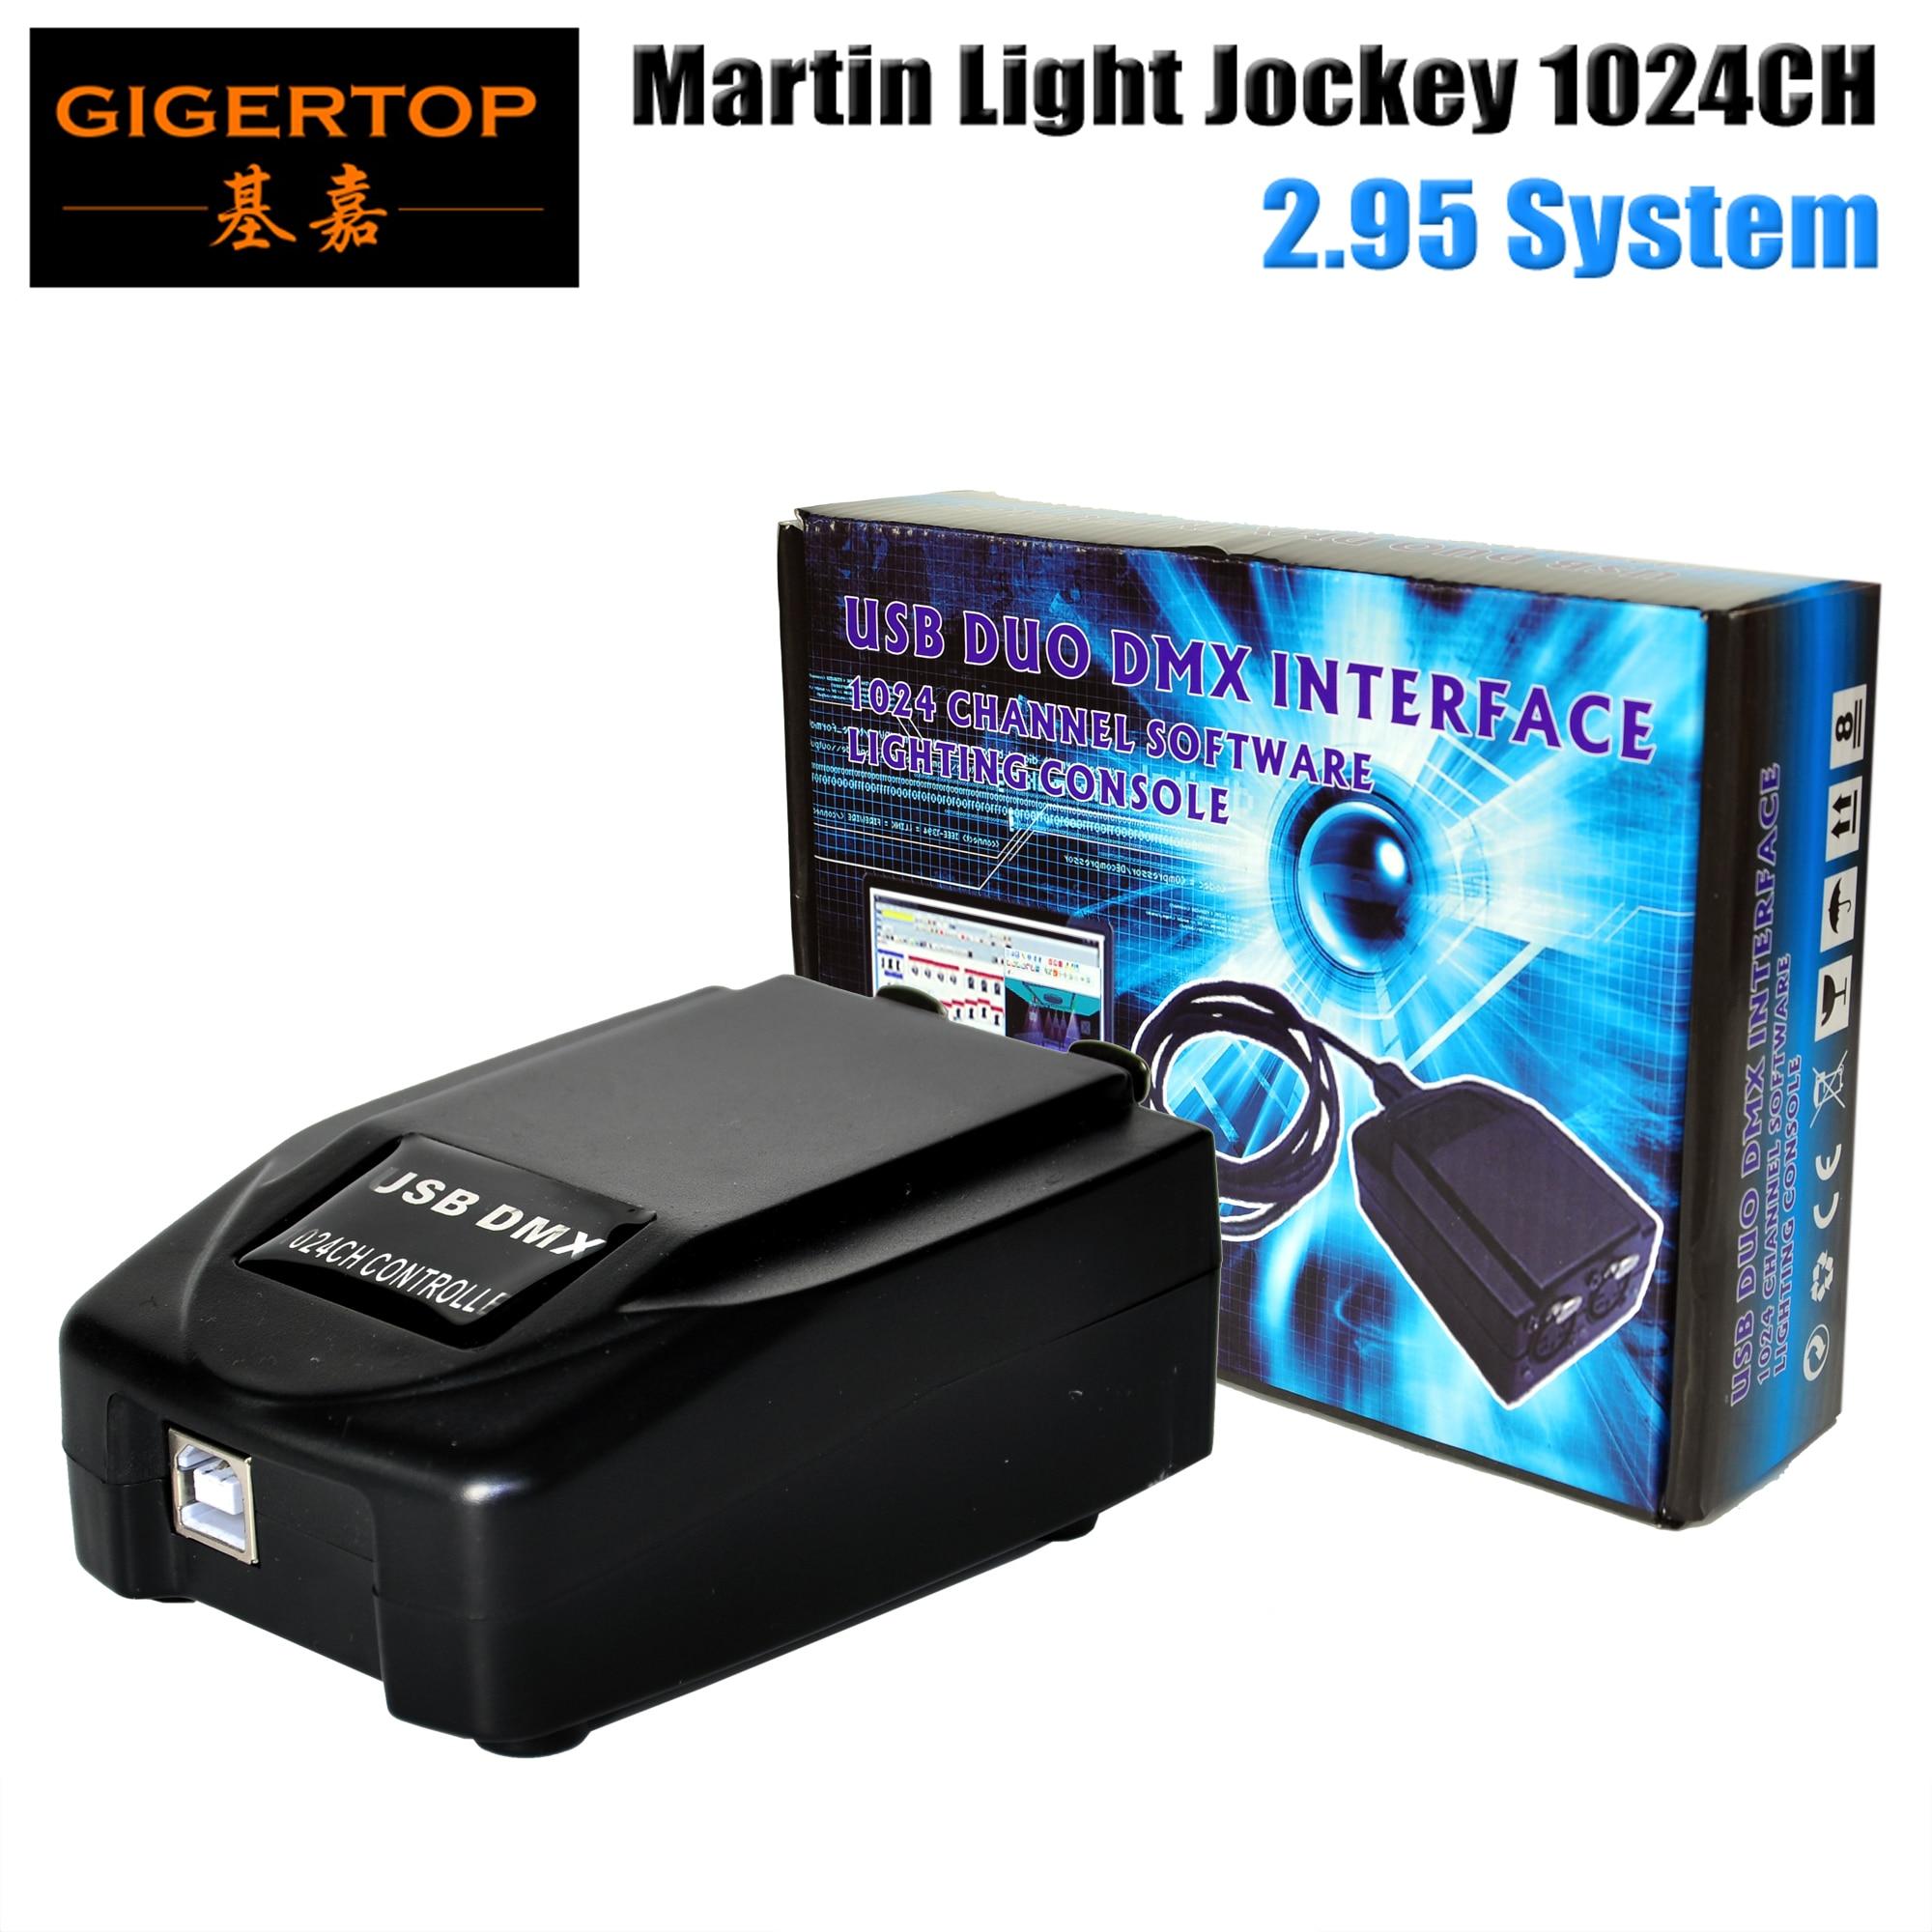 Envío gratuito Martin Lightjockey DMX Nueva caja USB mejorada Martin Light Jockey Hi-Quality LED Stage Light USB controller